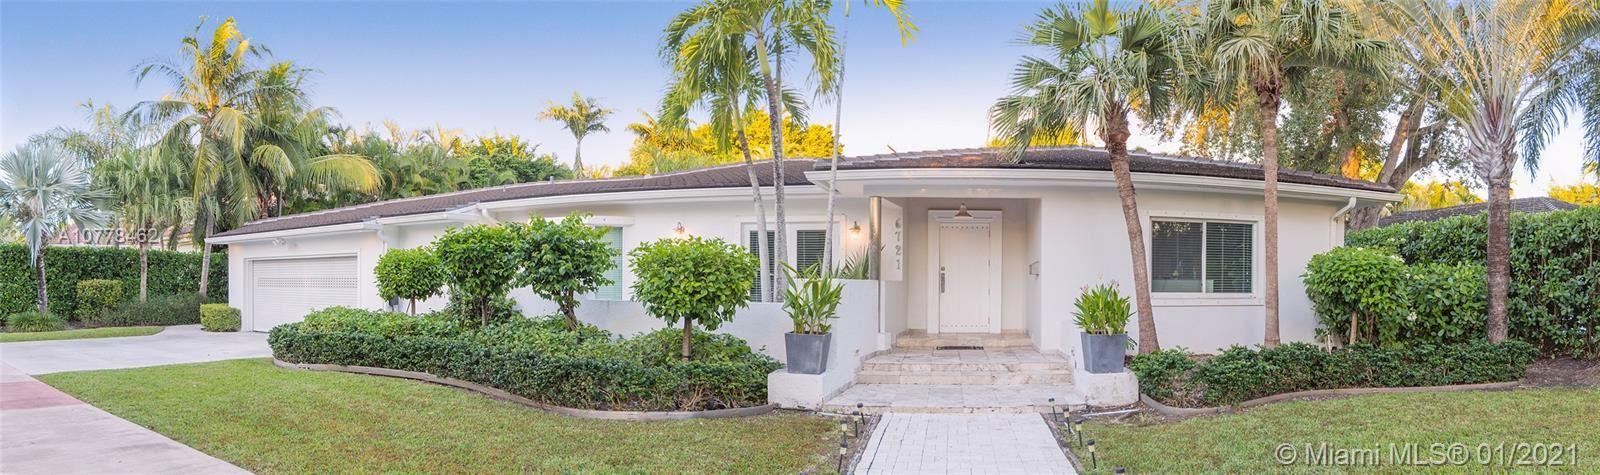 6721 Riviera Dr, Coral Gables, FL 33146 - #: A10778462